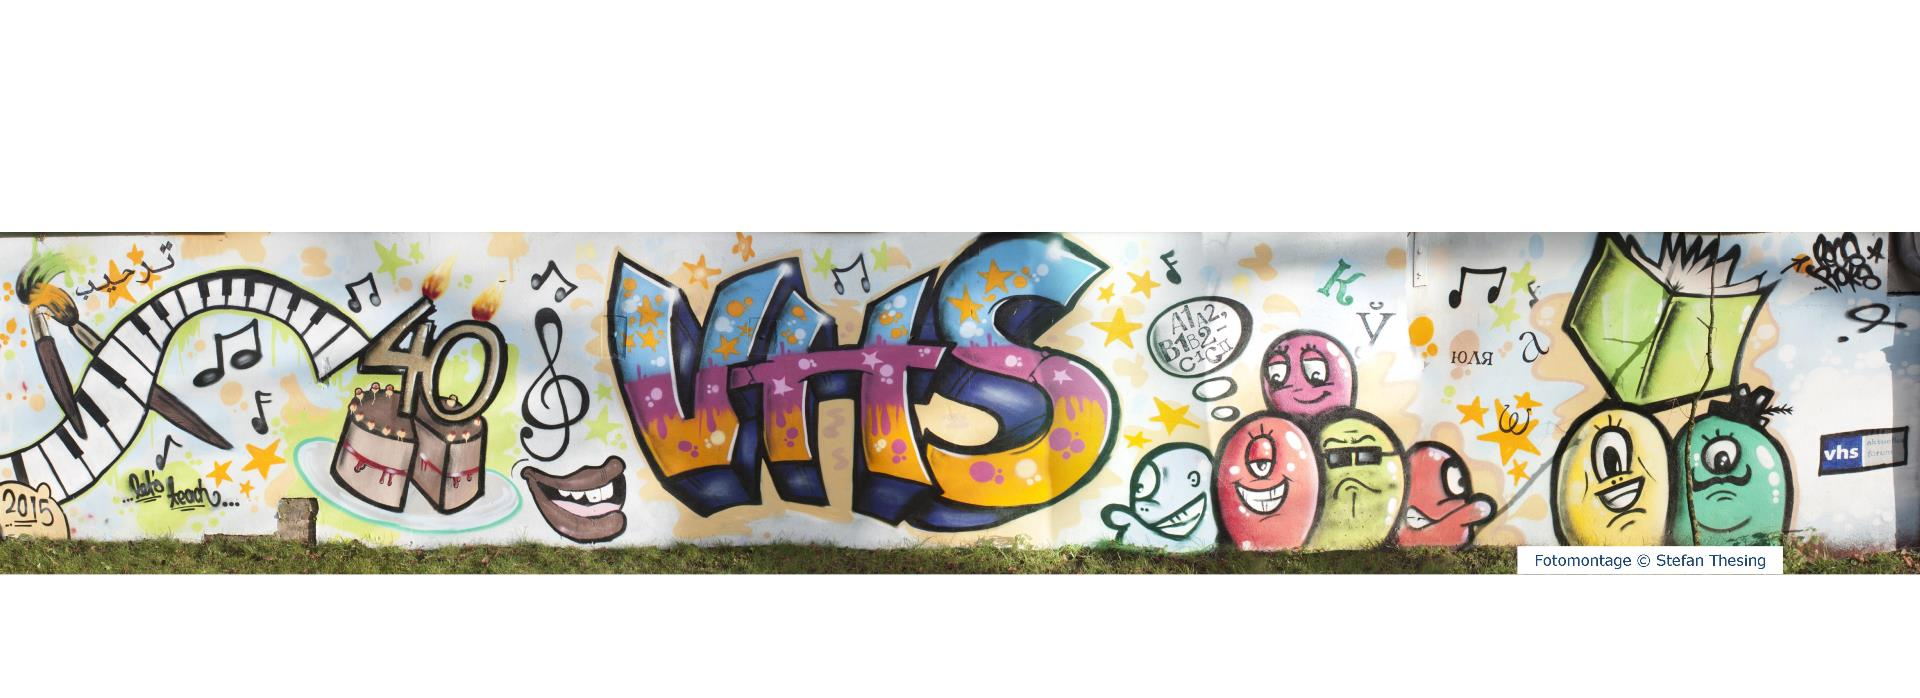 Graffiti 40. Geburtstag vhs